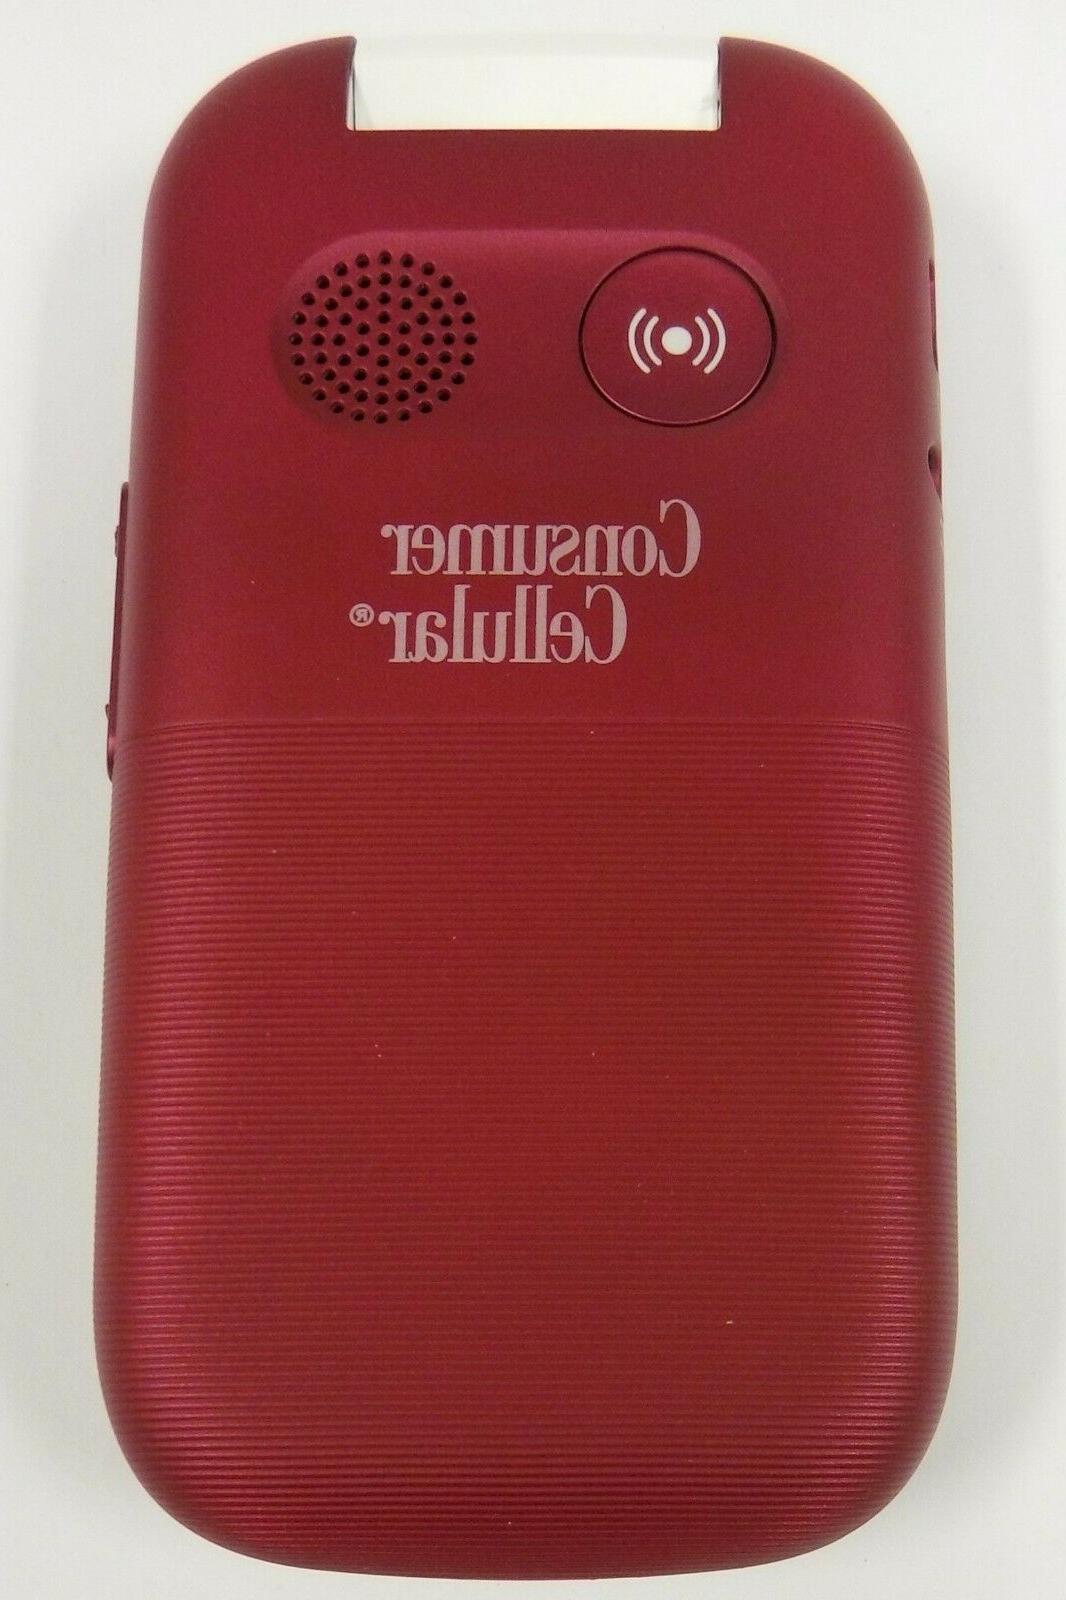 Doro 7050 DFC-0180 Red Phone -